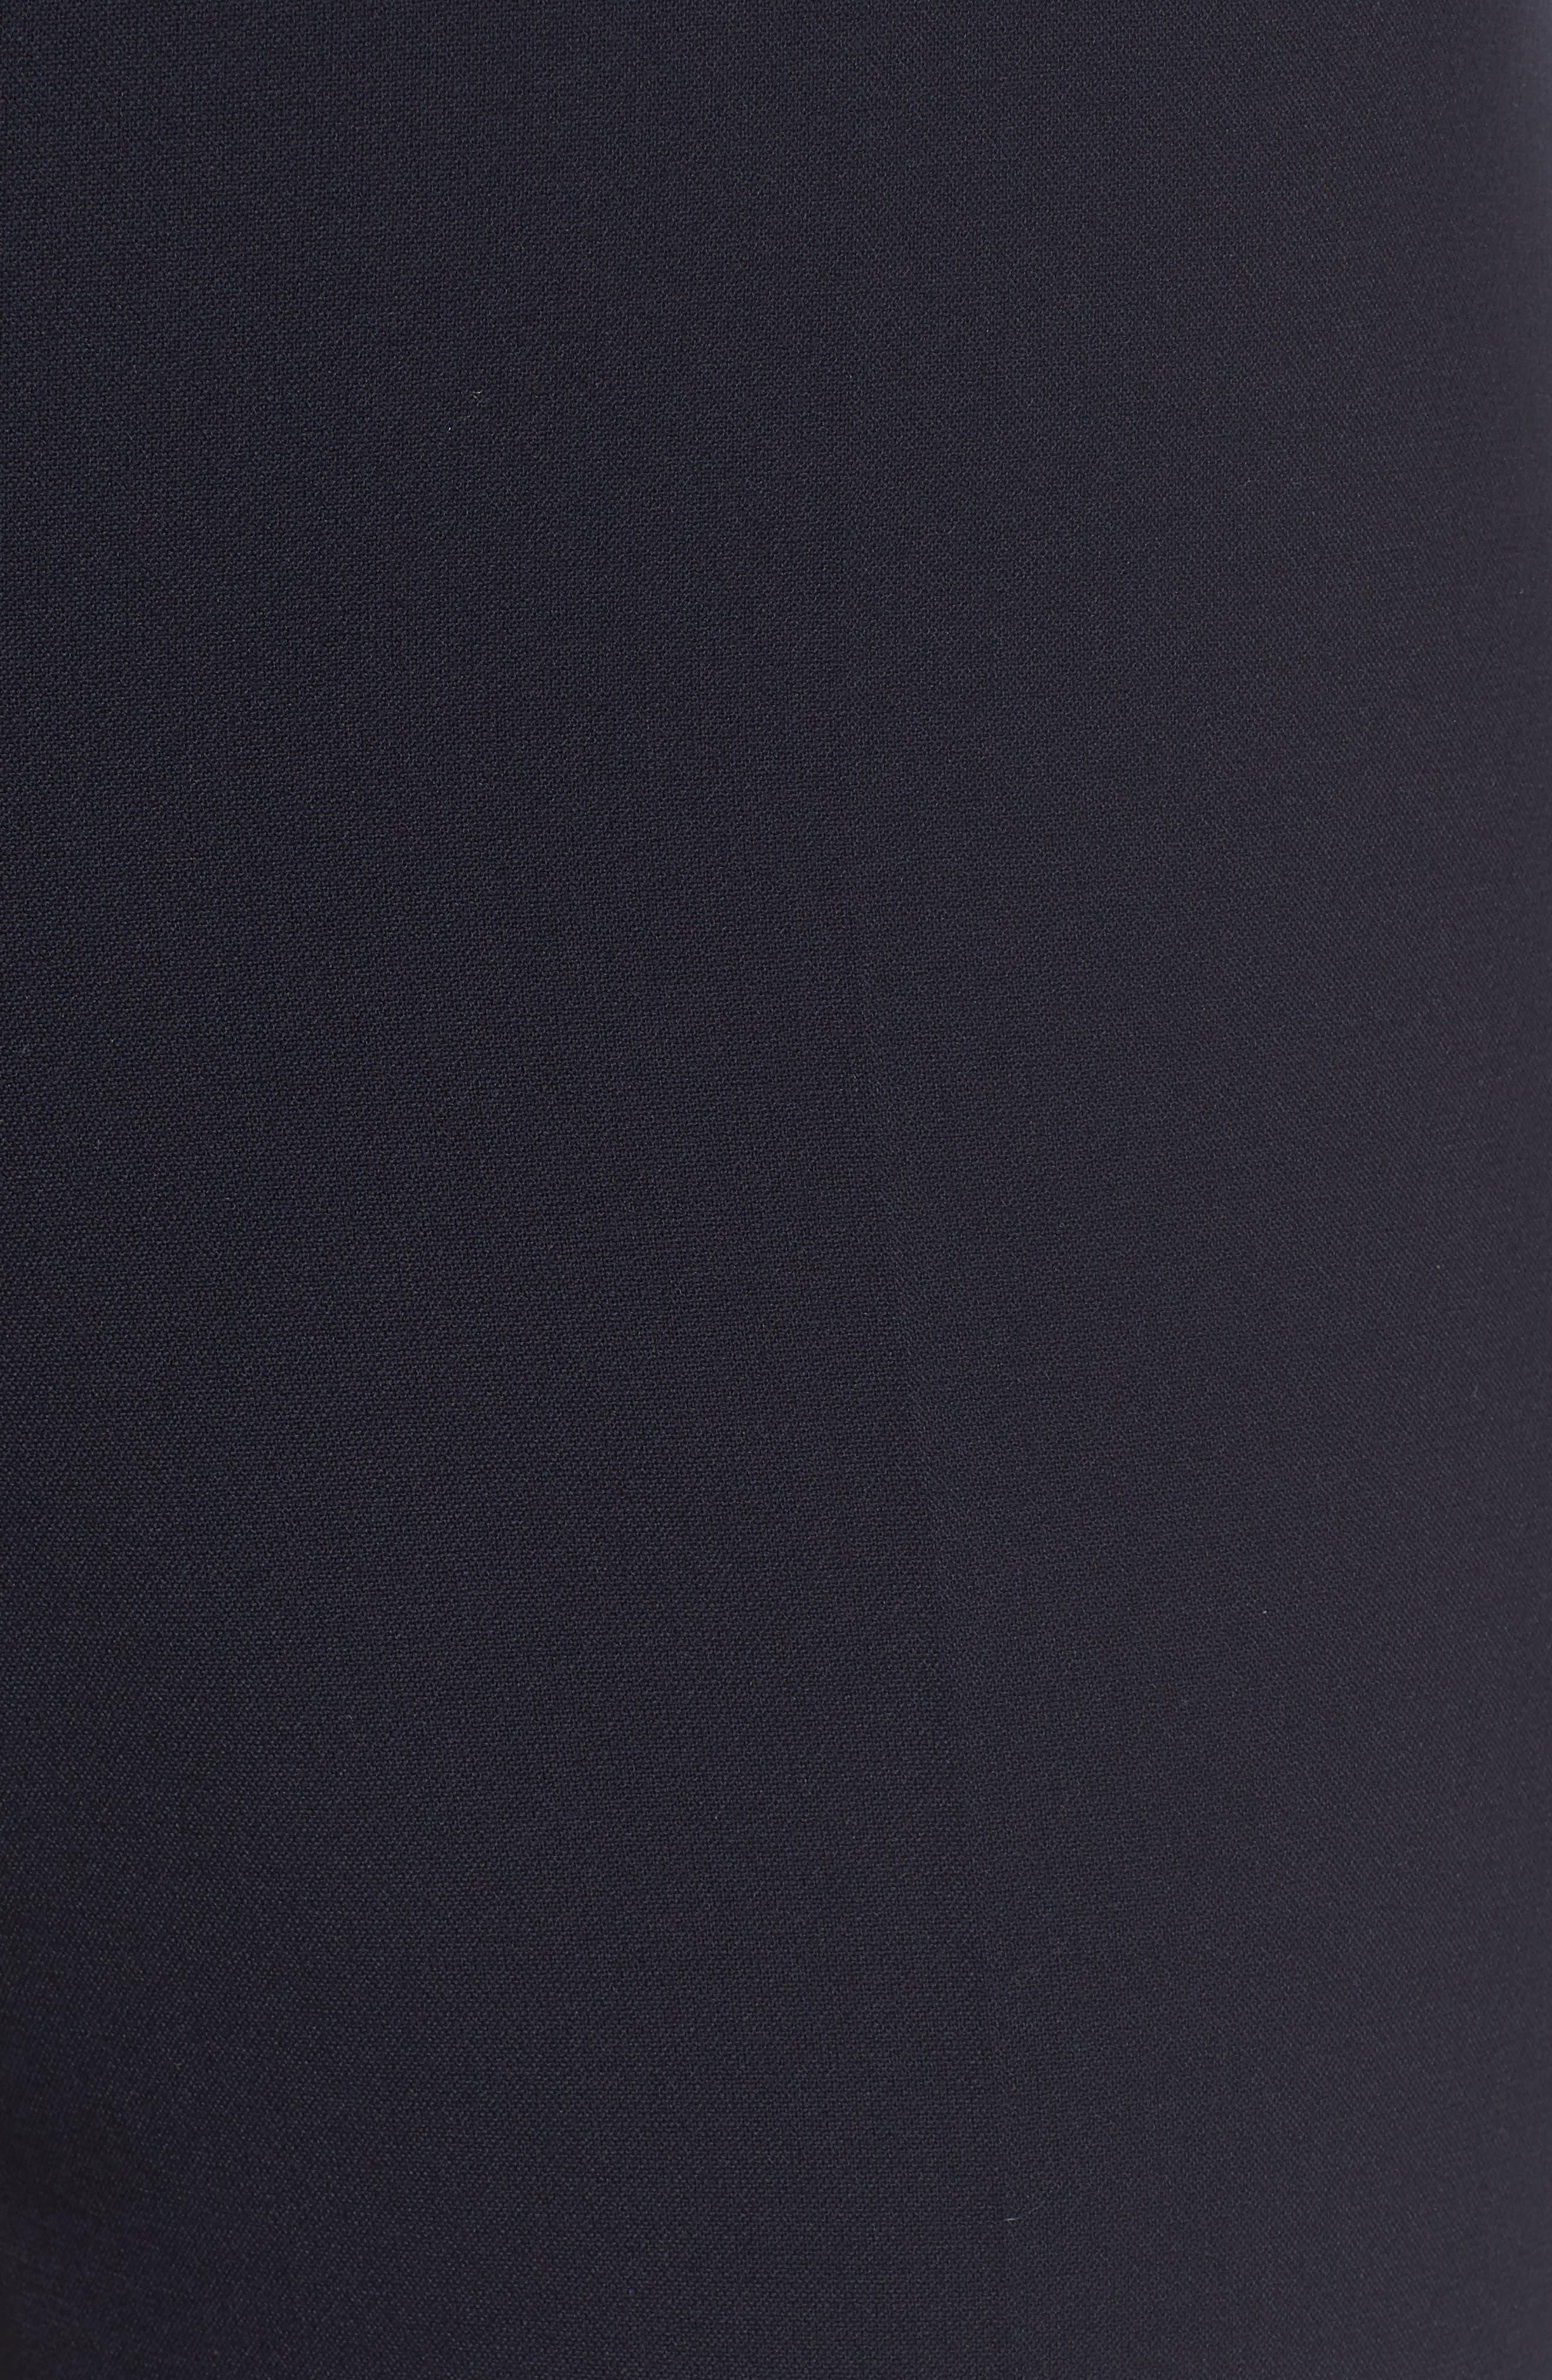 Tiluna Side Zip Ponte Trousers,                             Alternate thumbnail 5, color,                             Navy